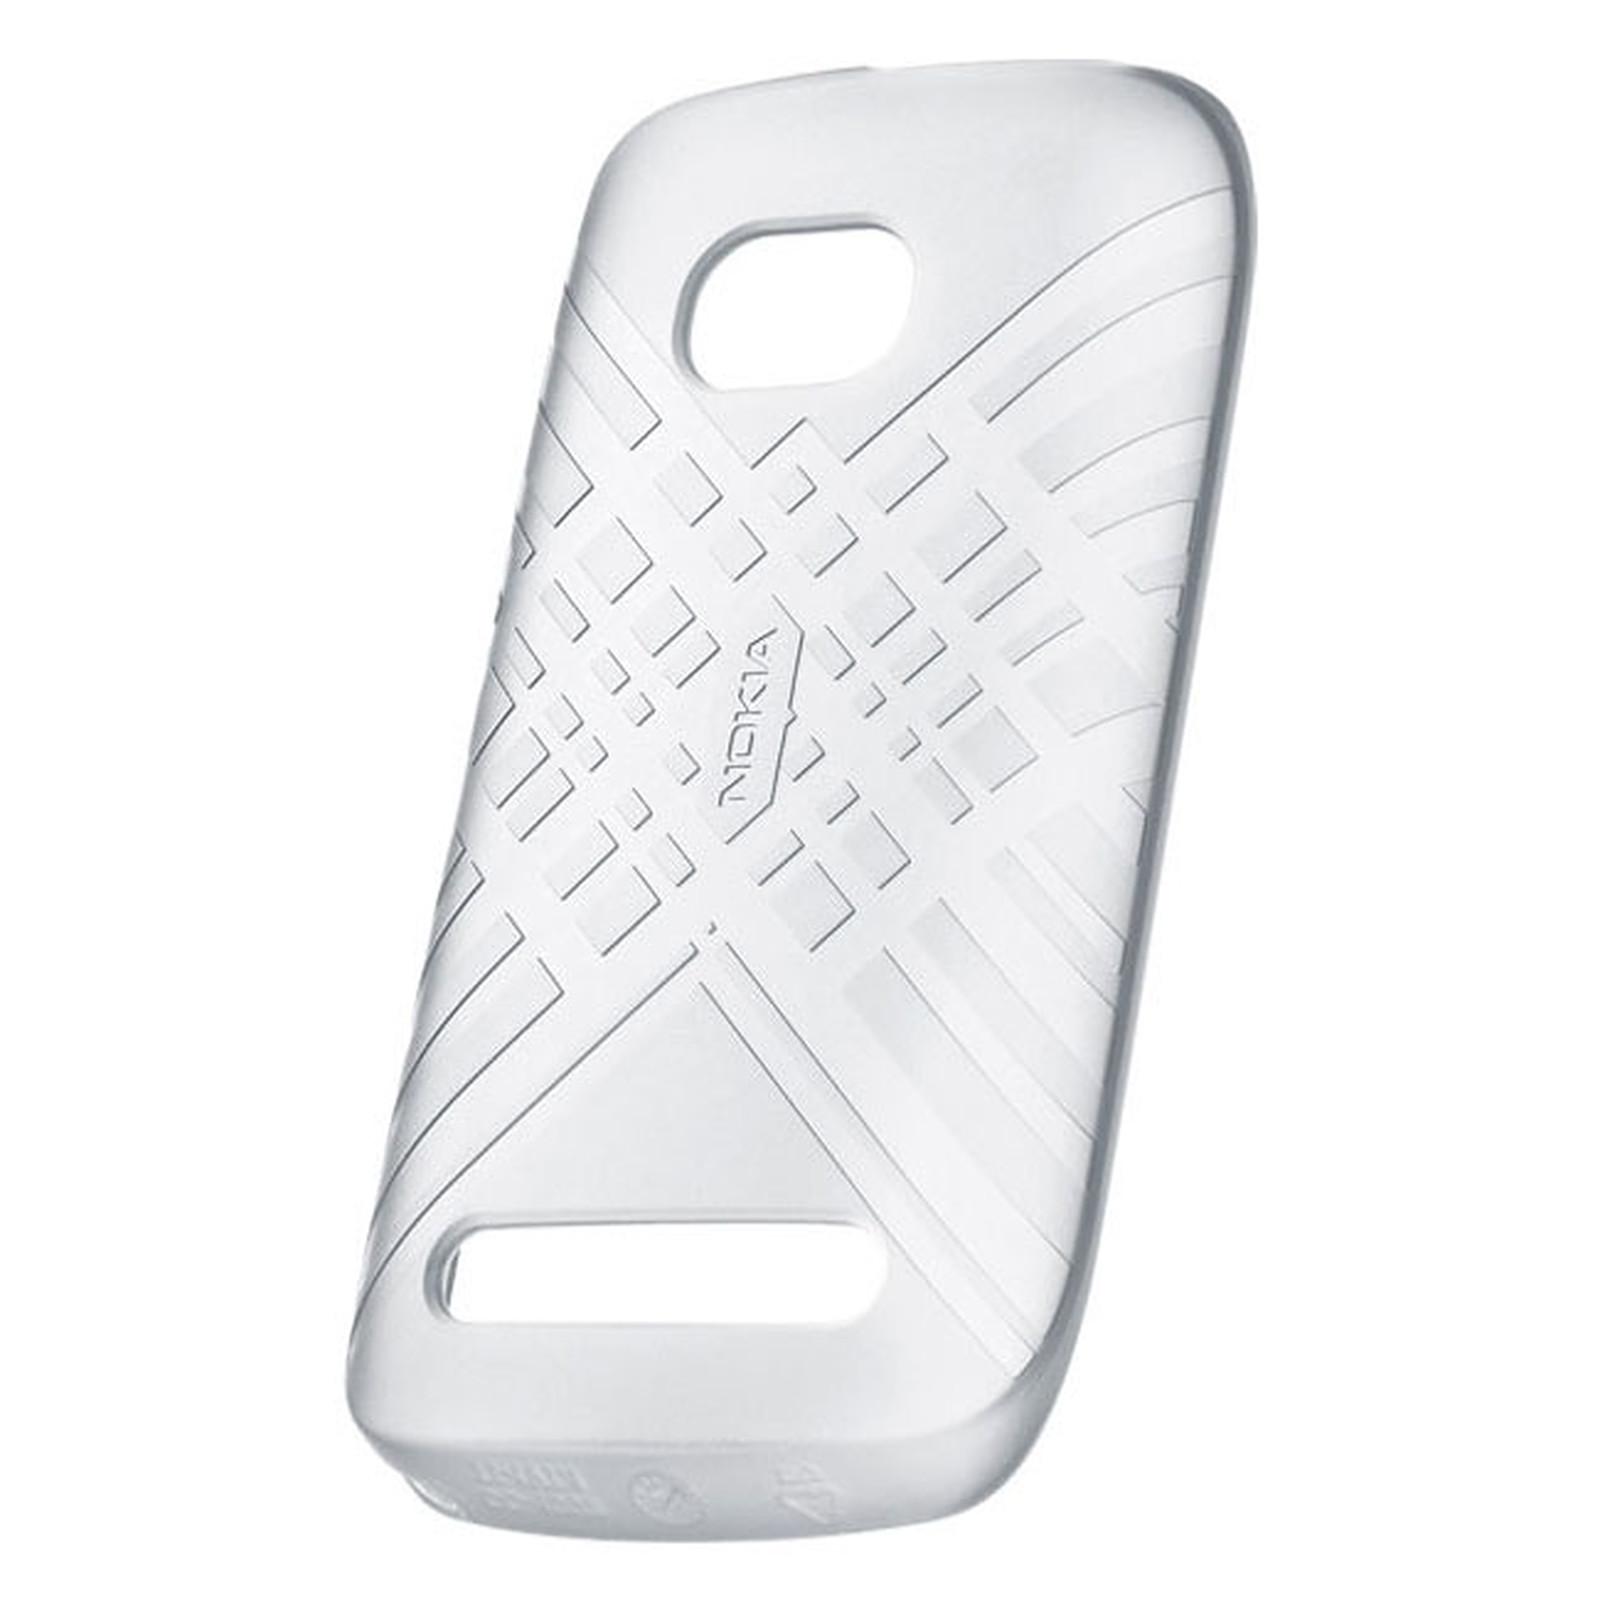 Nokia Soft Cover CC-1032 Blanche